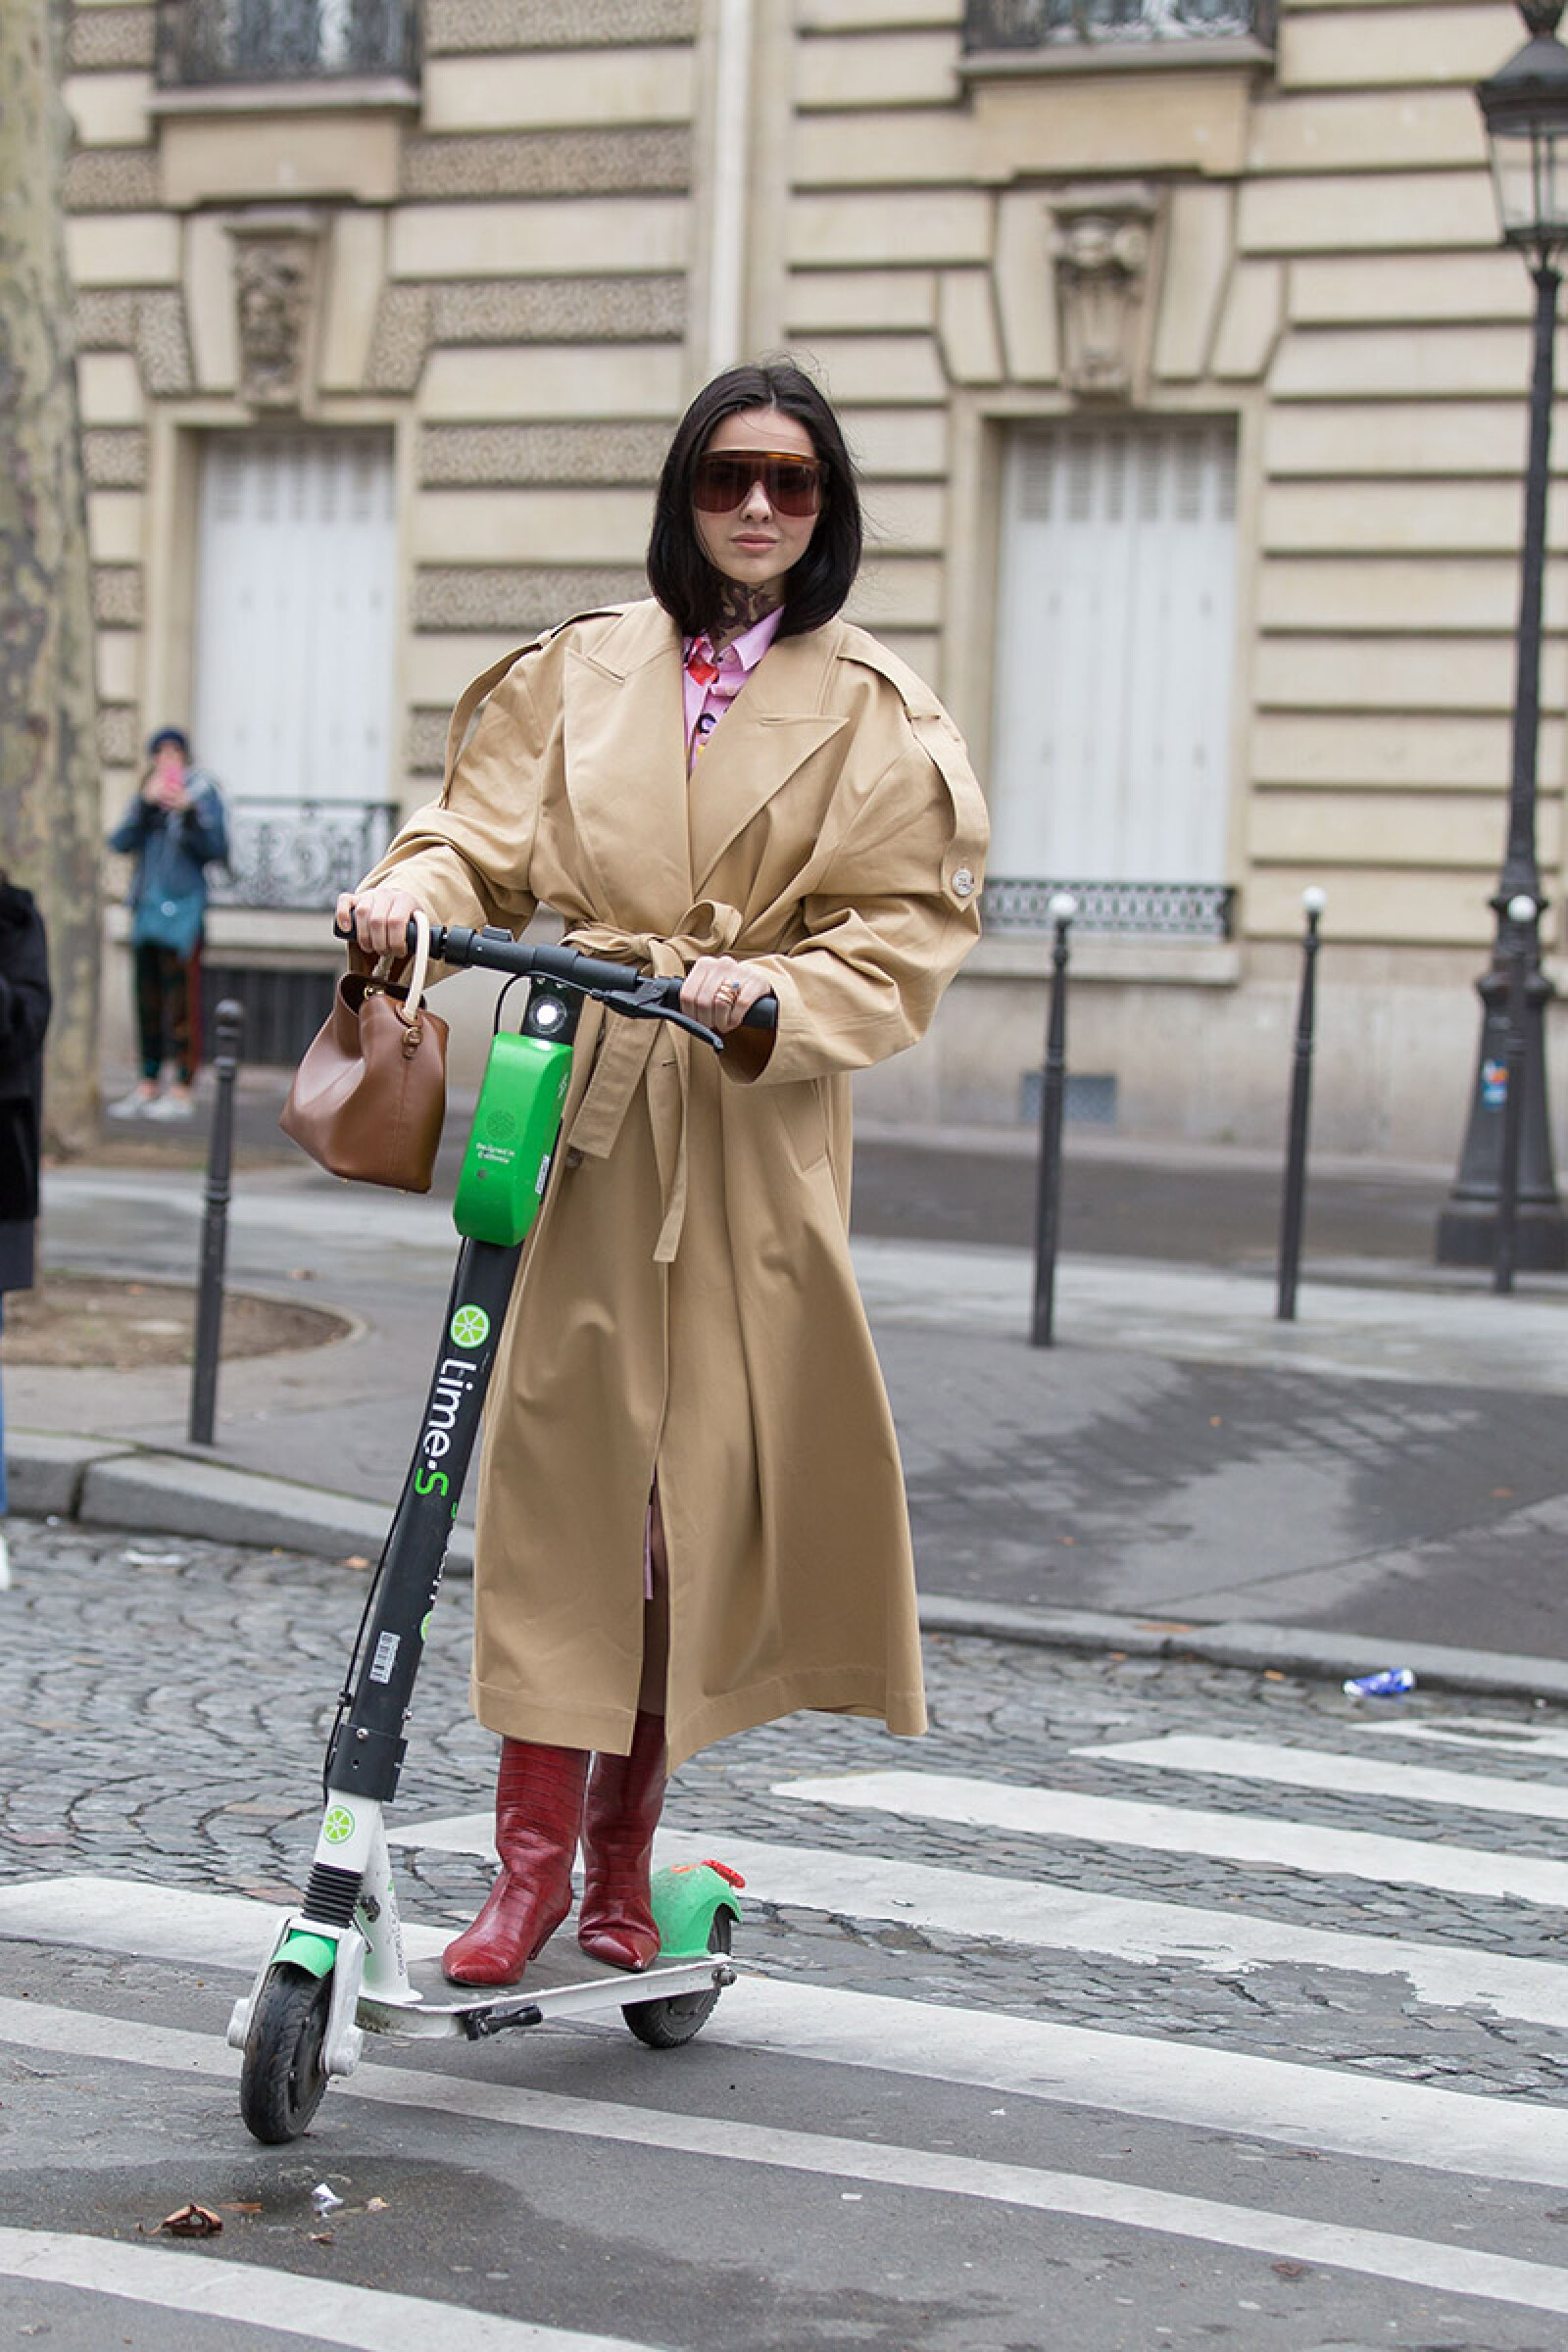 Street Style, Fall Winter 2019, Paris Fashion Week, France - 02 Mar 2019